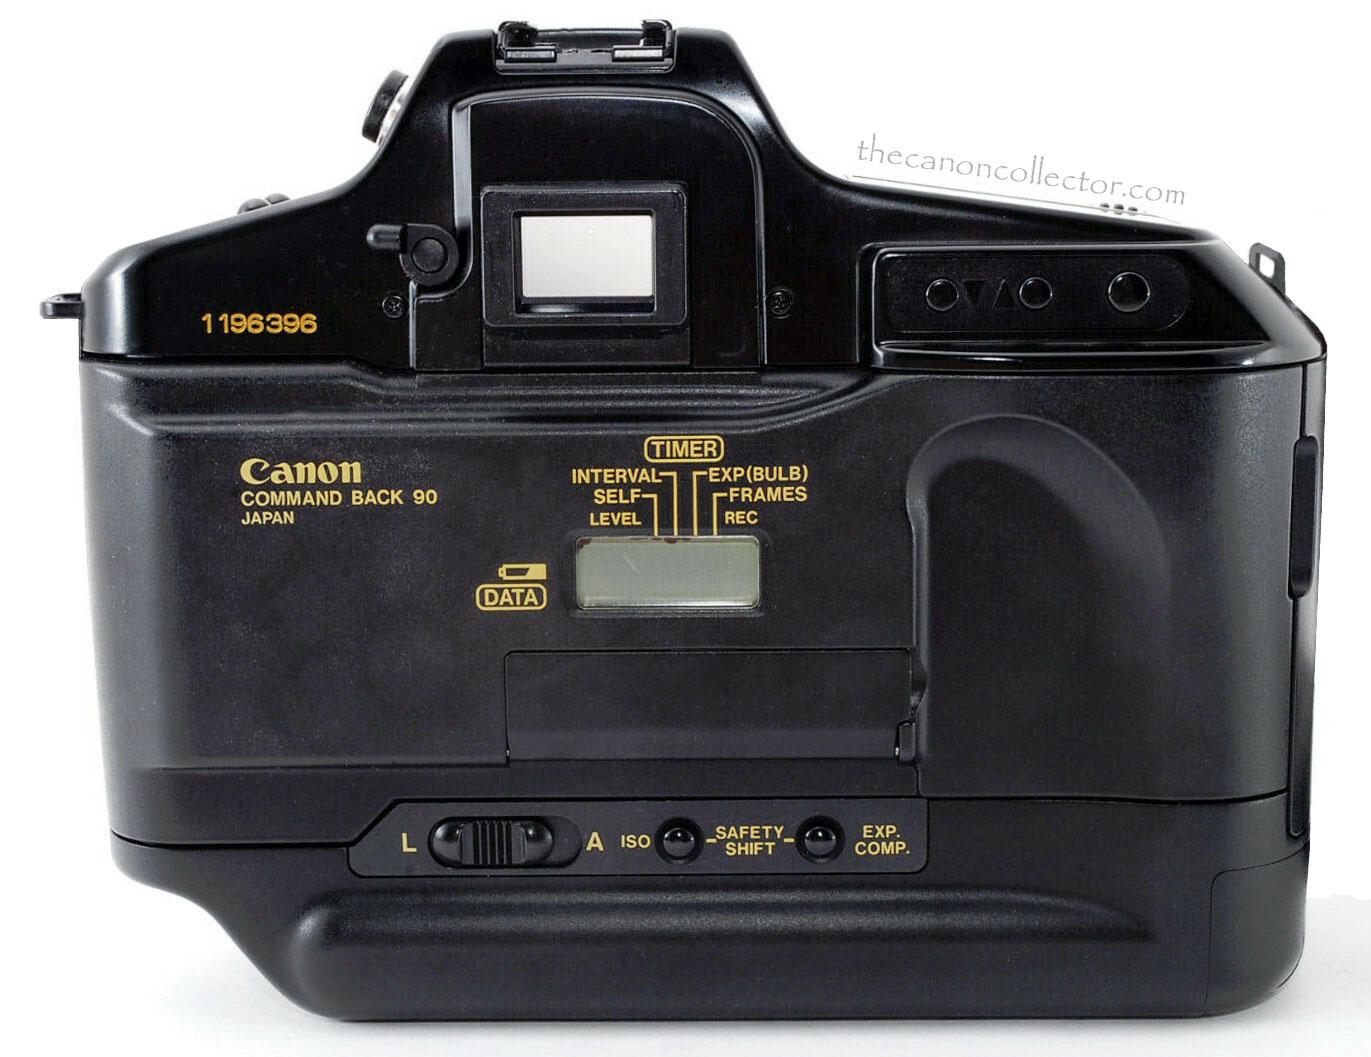 Canon Command Back 90